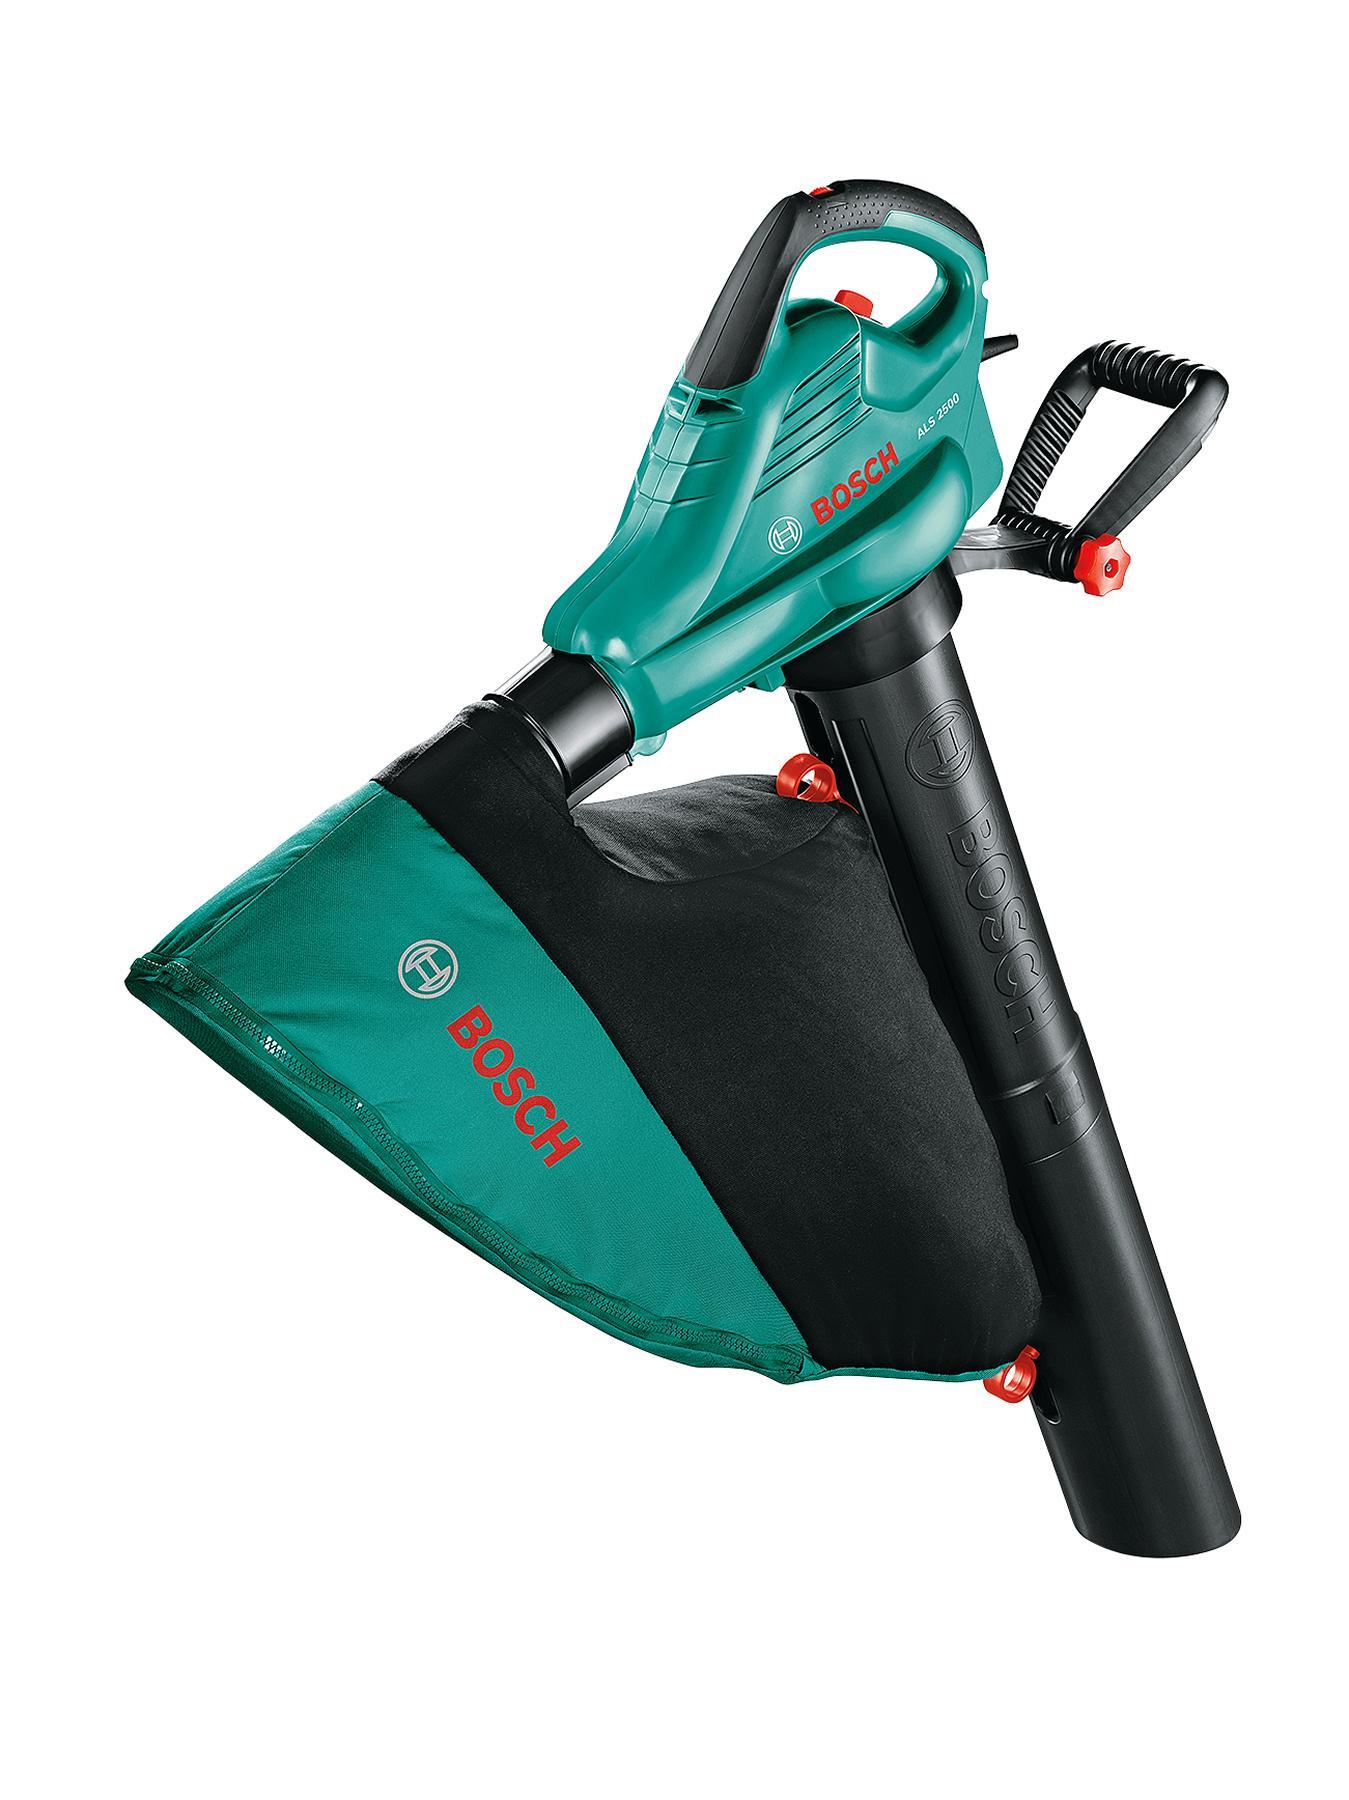 Bosch ALS 2500 Blower Vac